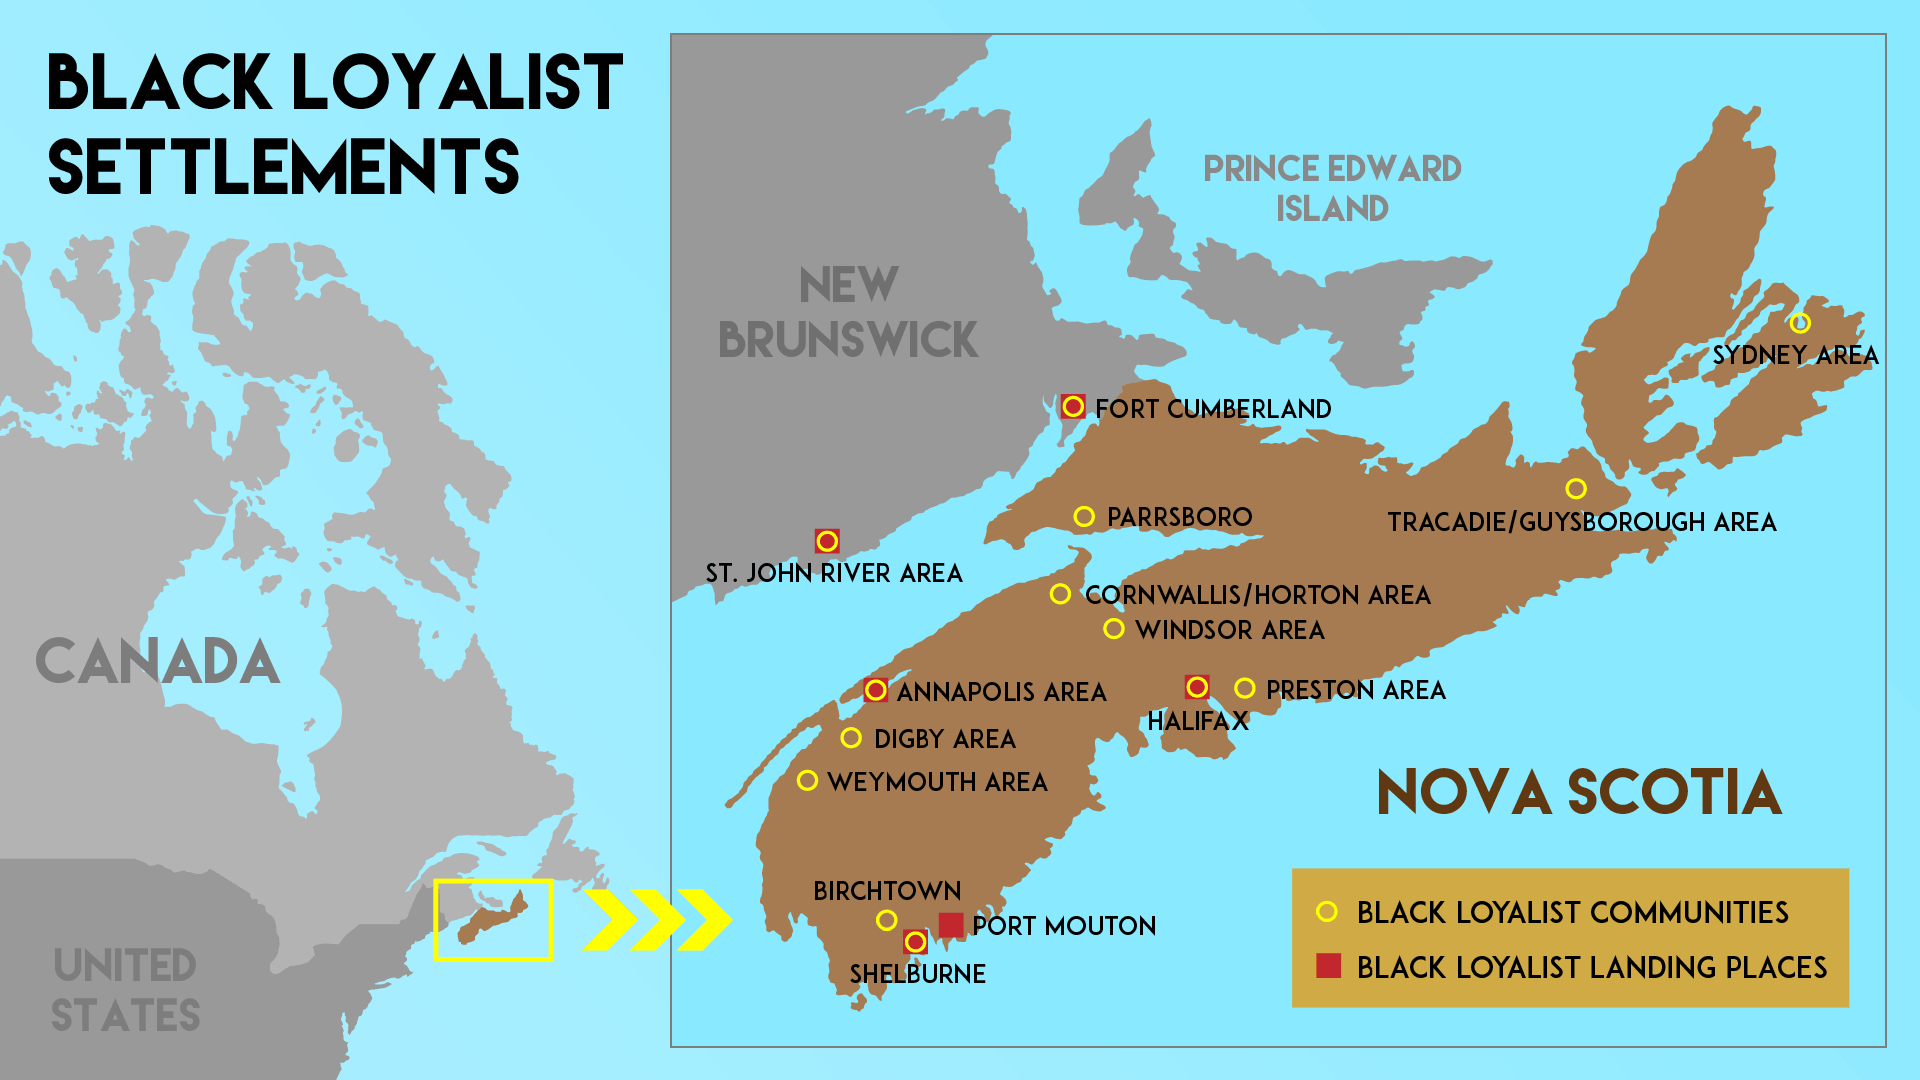 Map_LoyalistSettlements_1920x1080